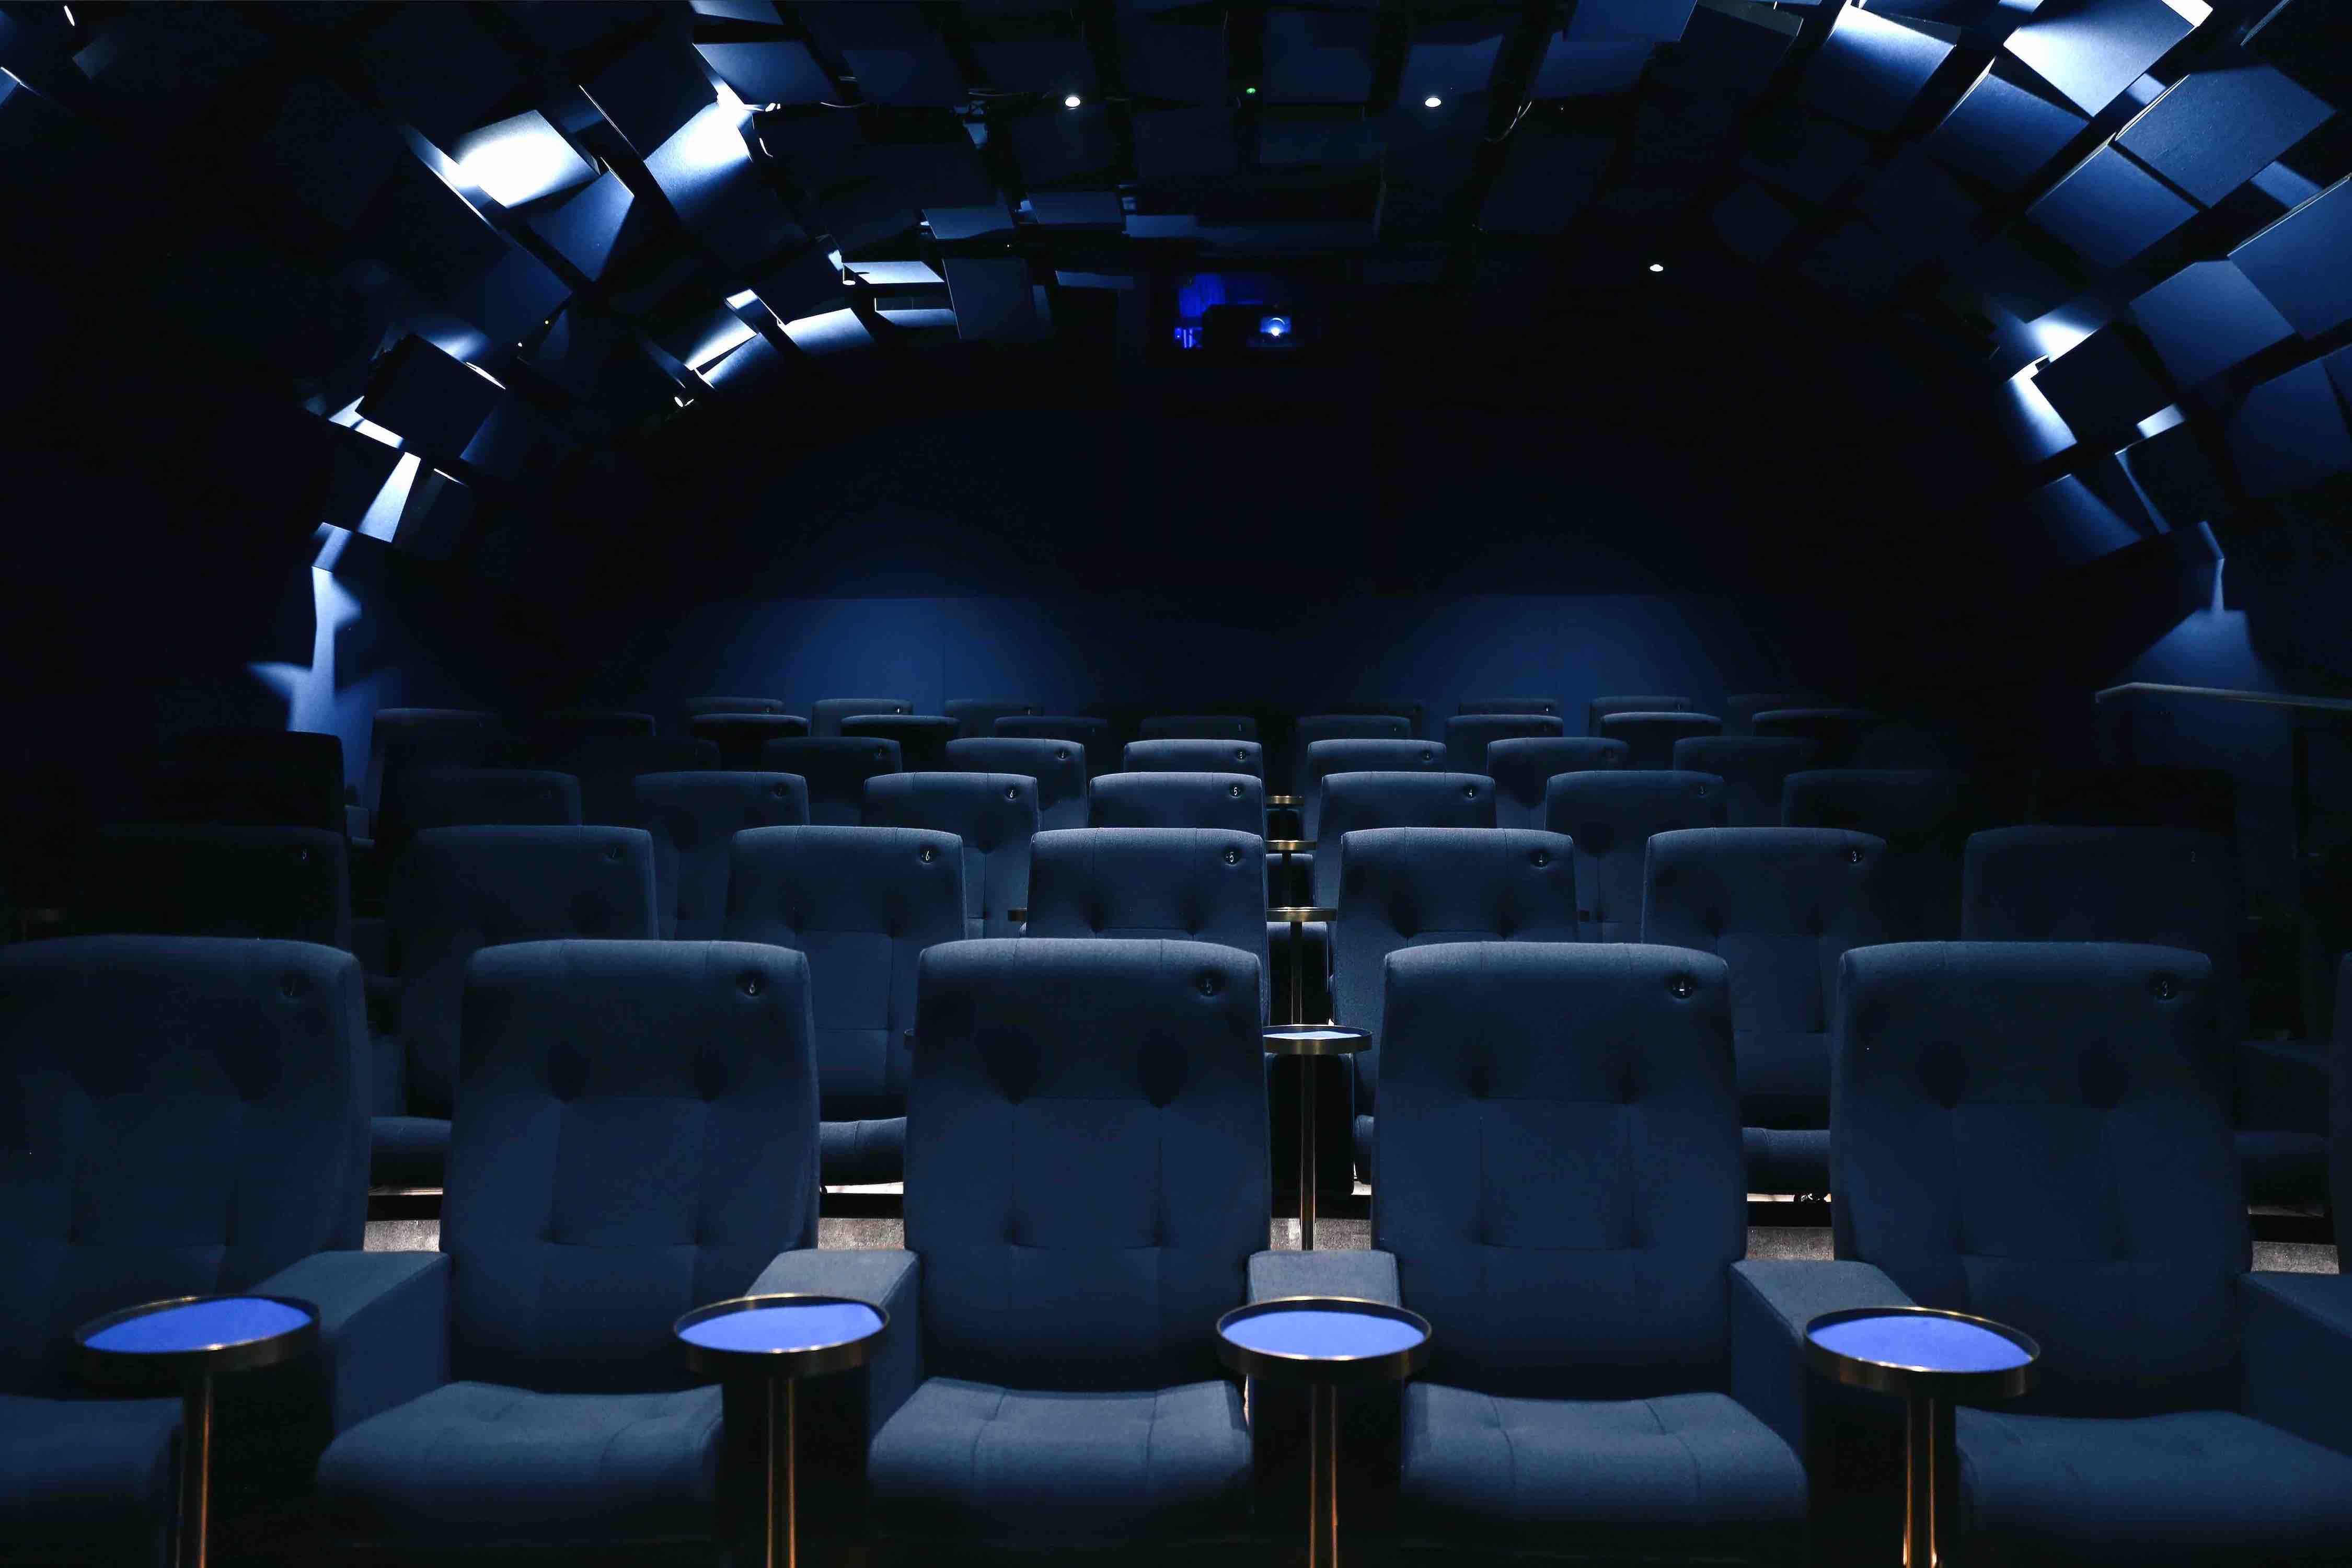 Archlight cinema